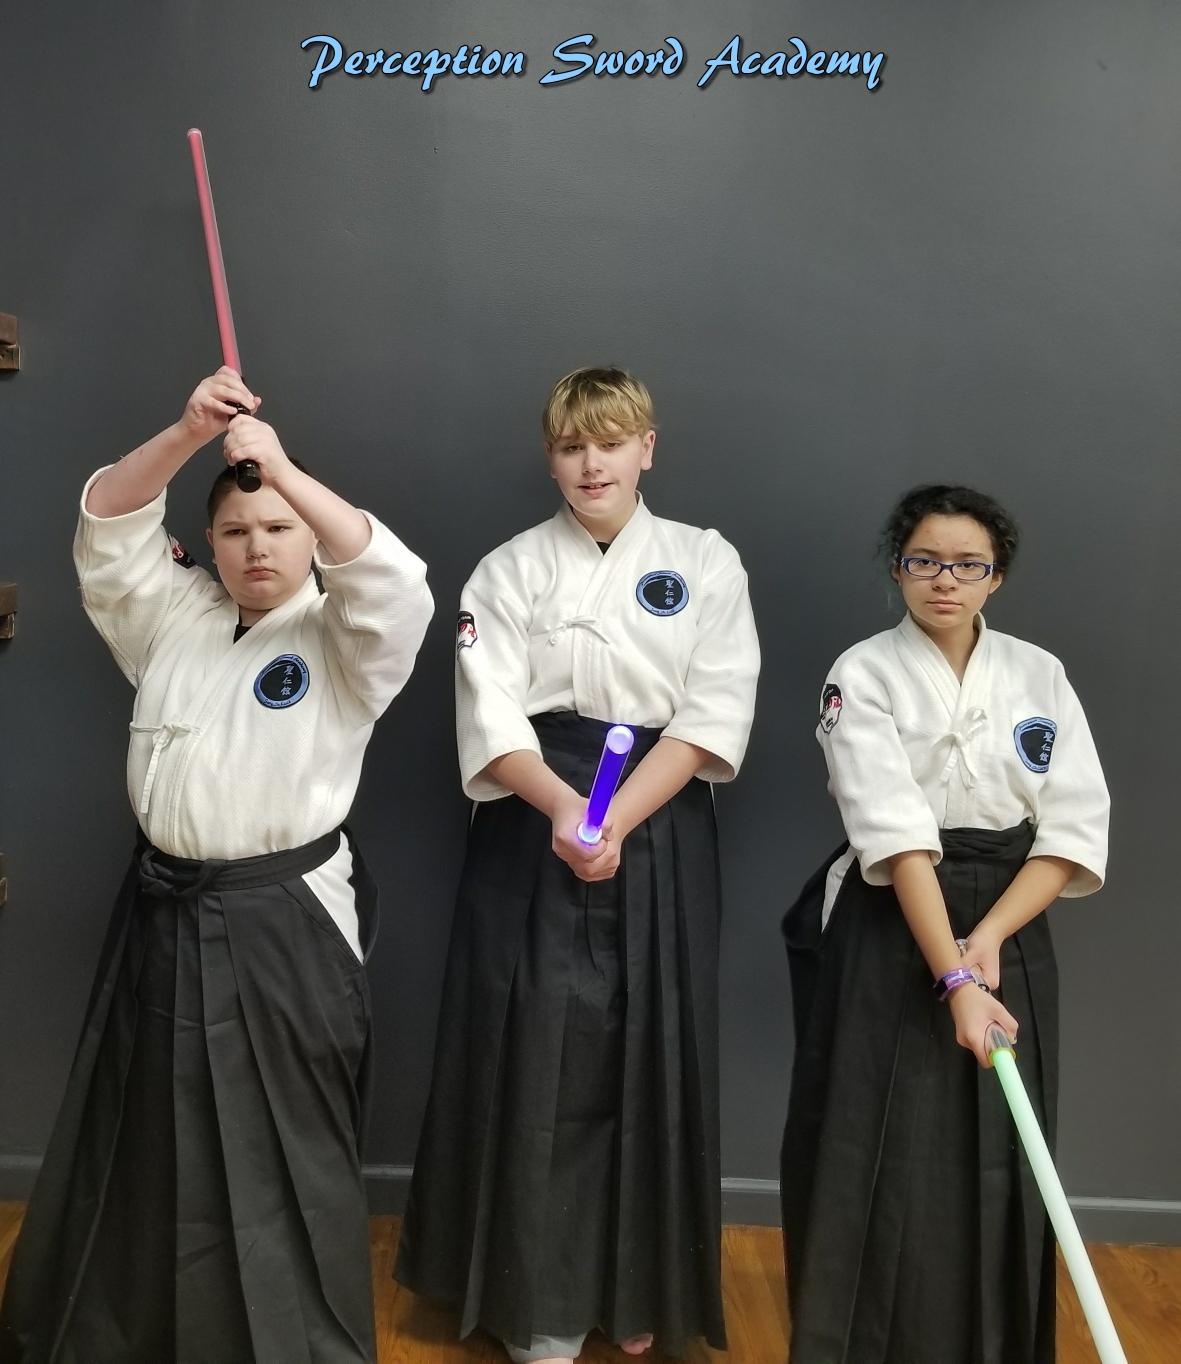 Perception Sword Academy_lightsabers